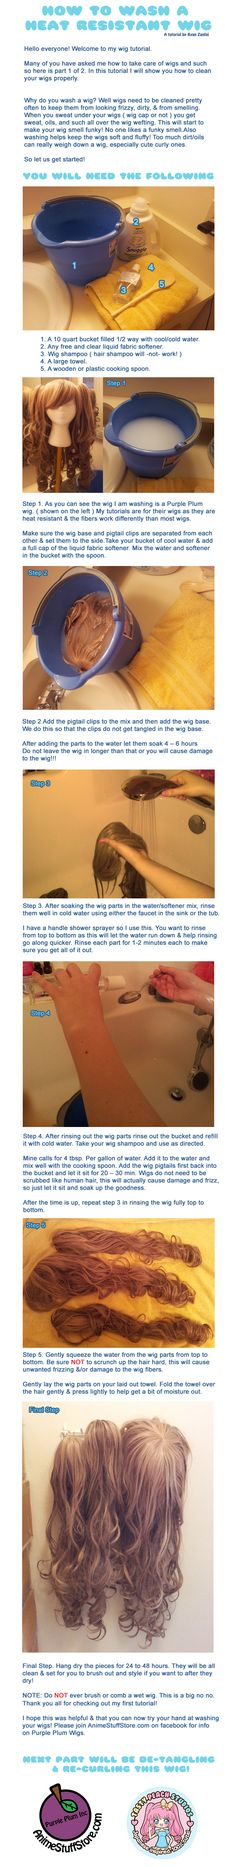 How to Wash a Heat Resistant Wig by MoogleGurl.deviantart.com on @deviantART